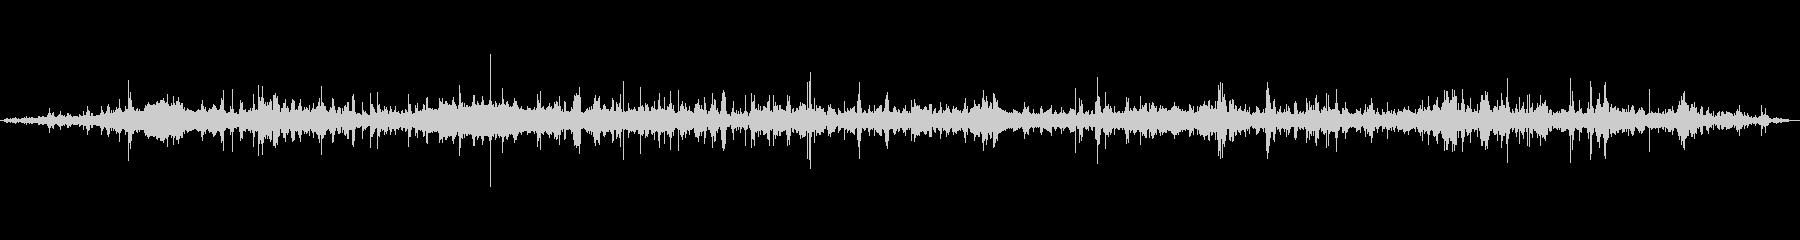 [ASMR]波打ち際の音_006の未再生の波形